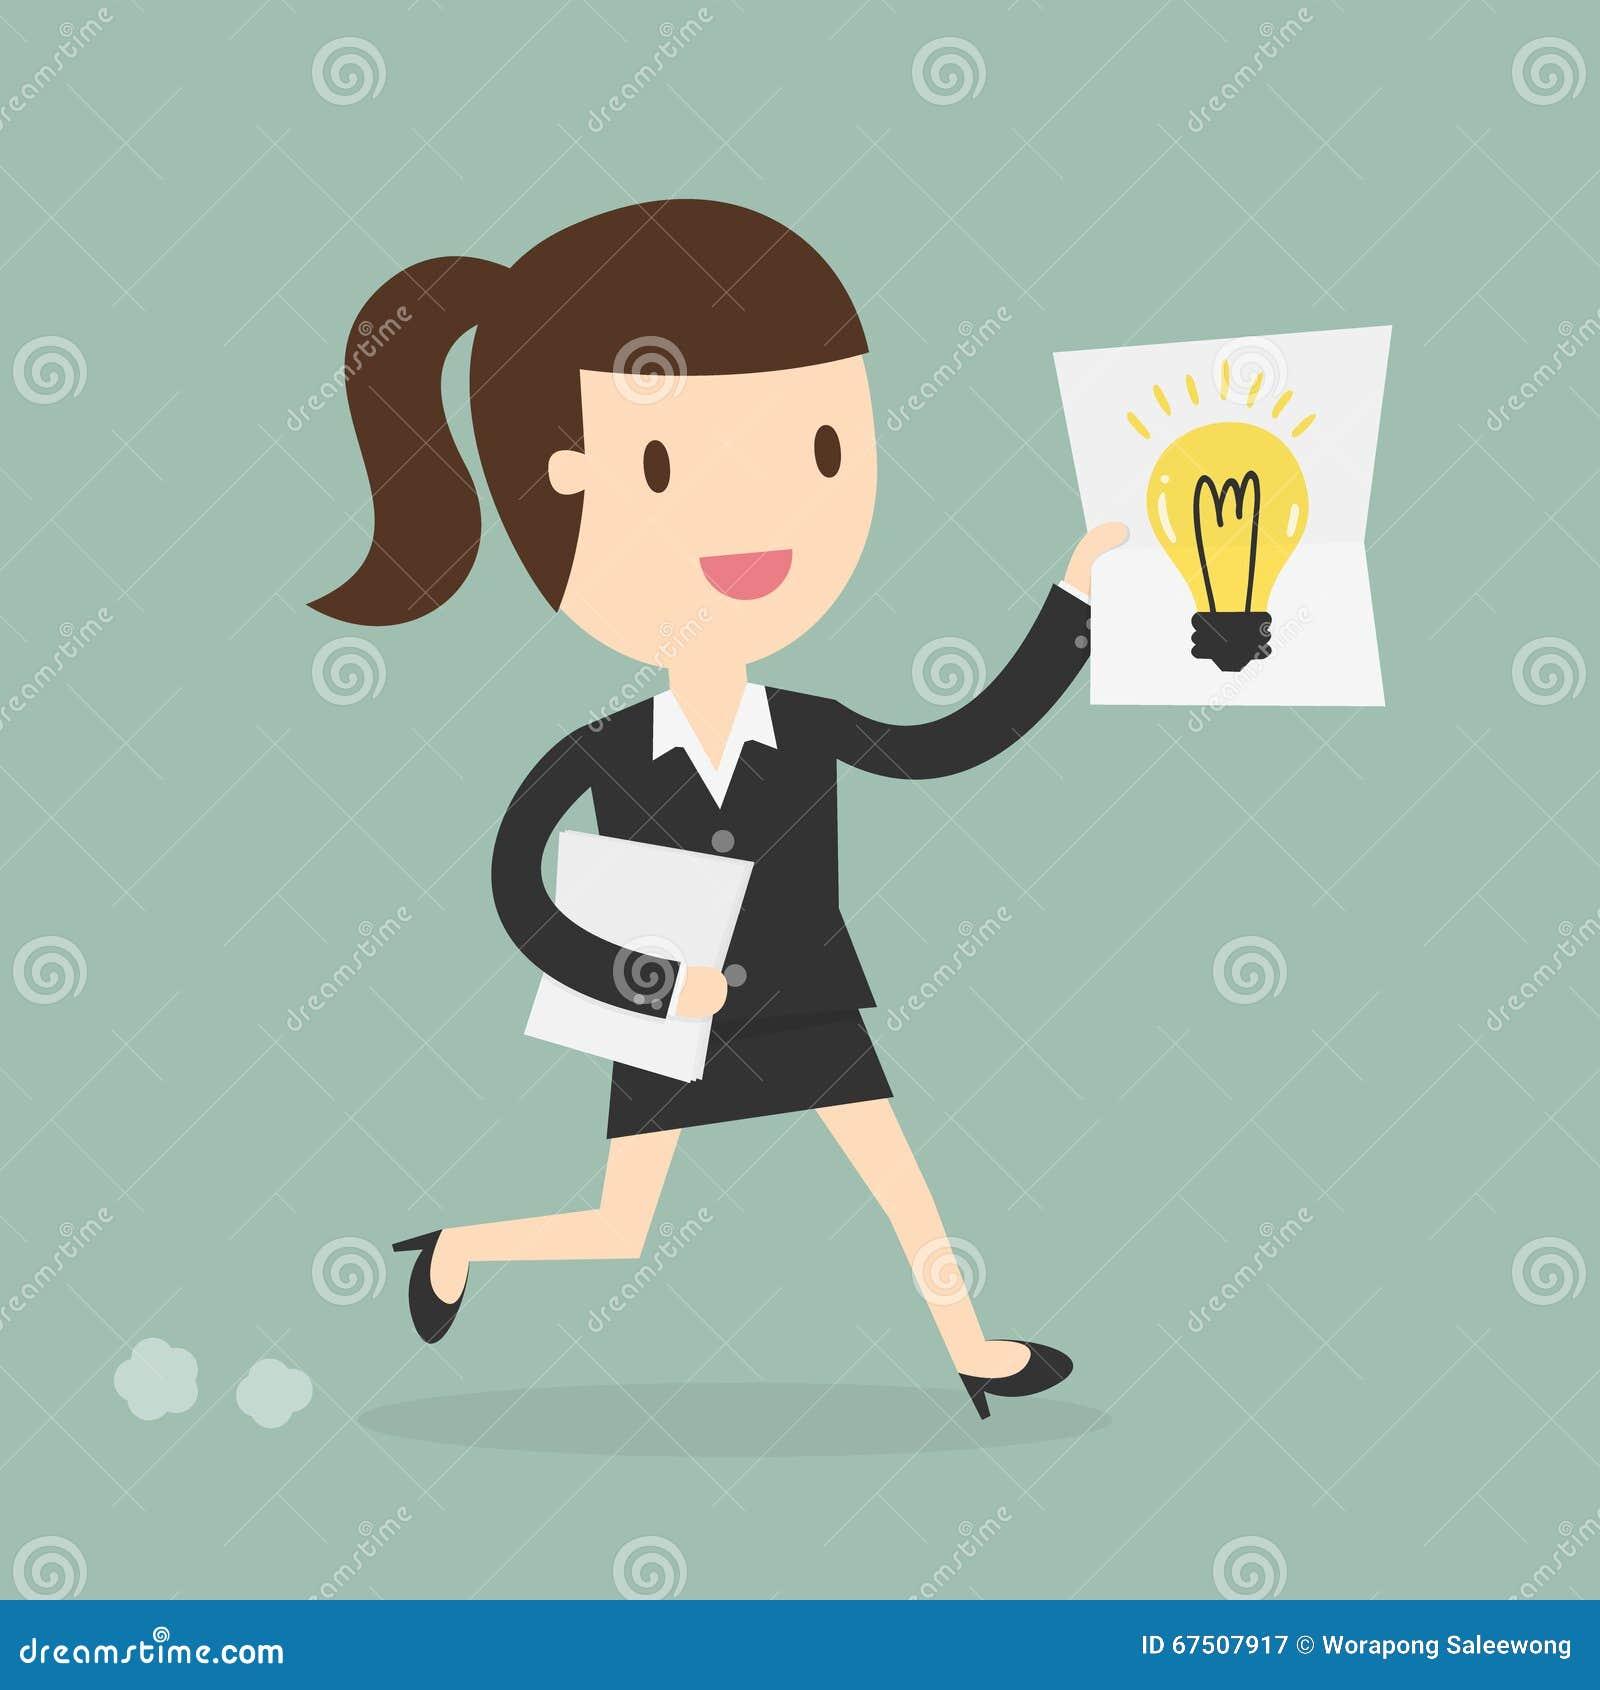 best selling stock photo ideas - Idea Seller Stock Vector Image